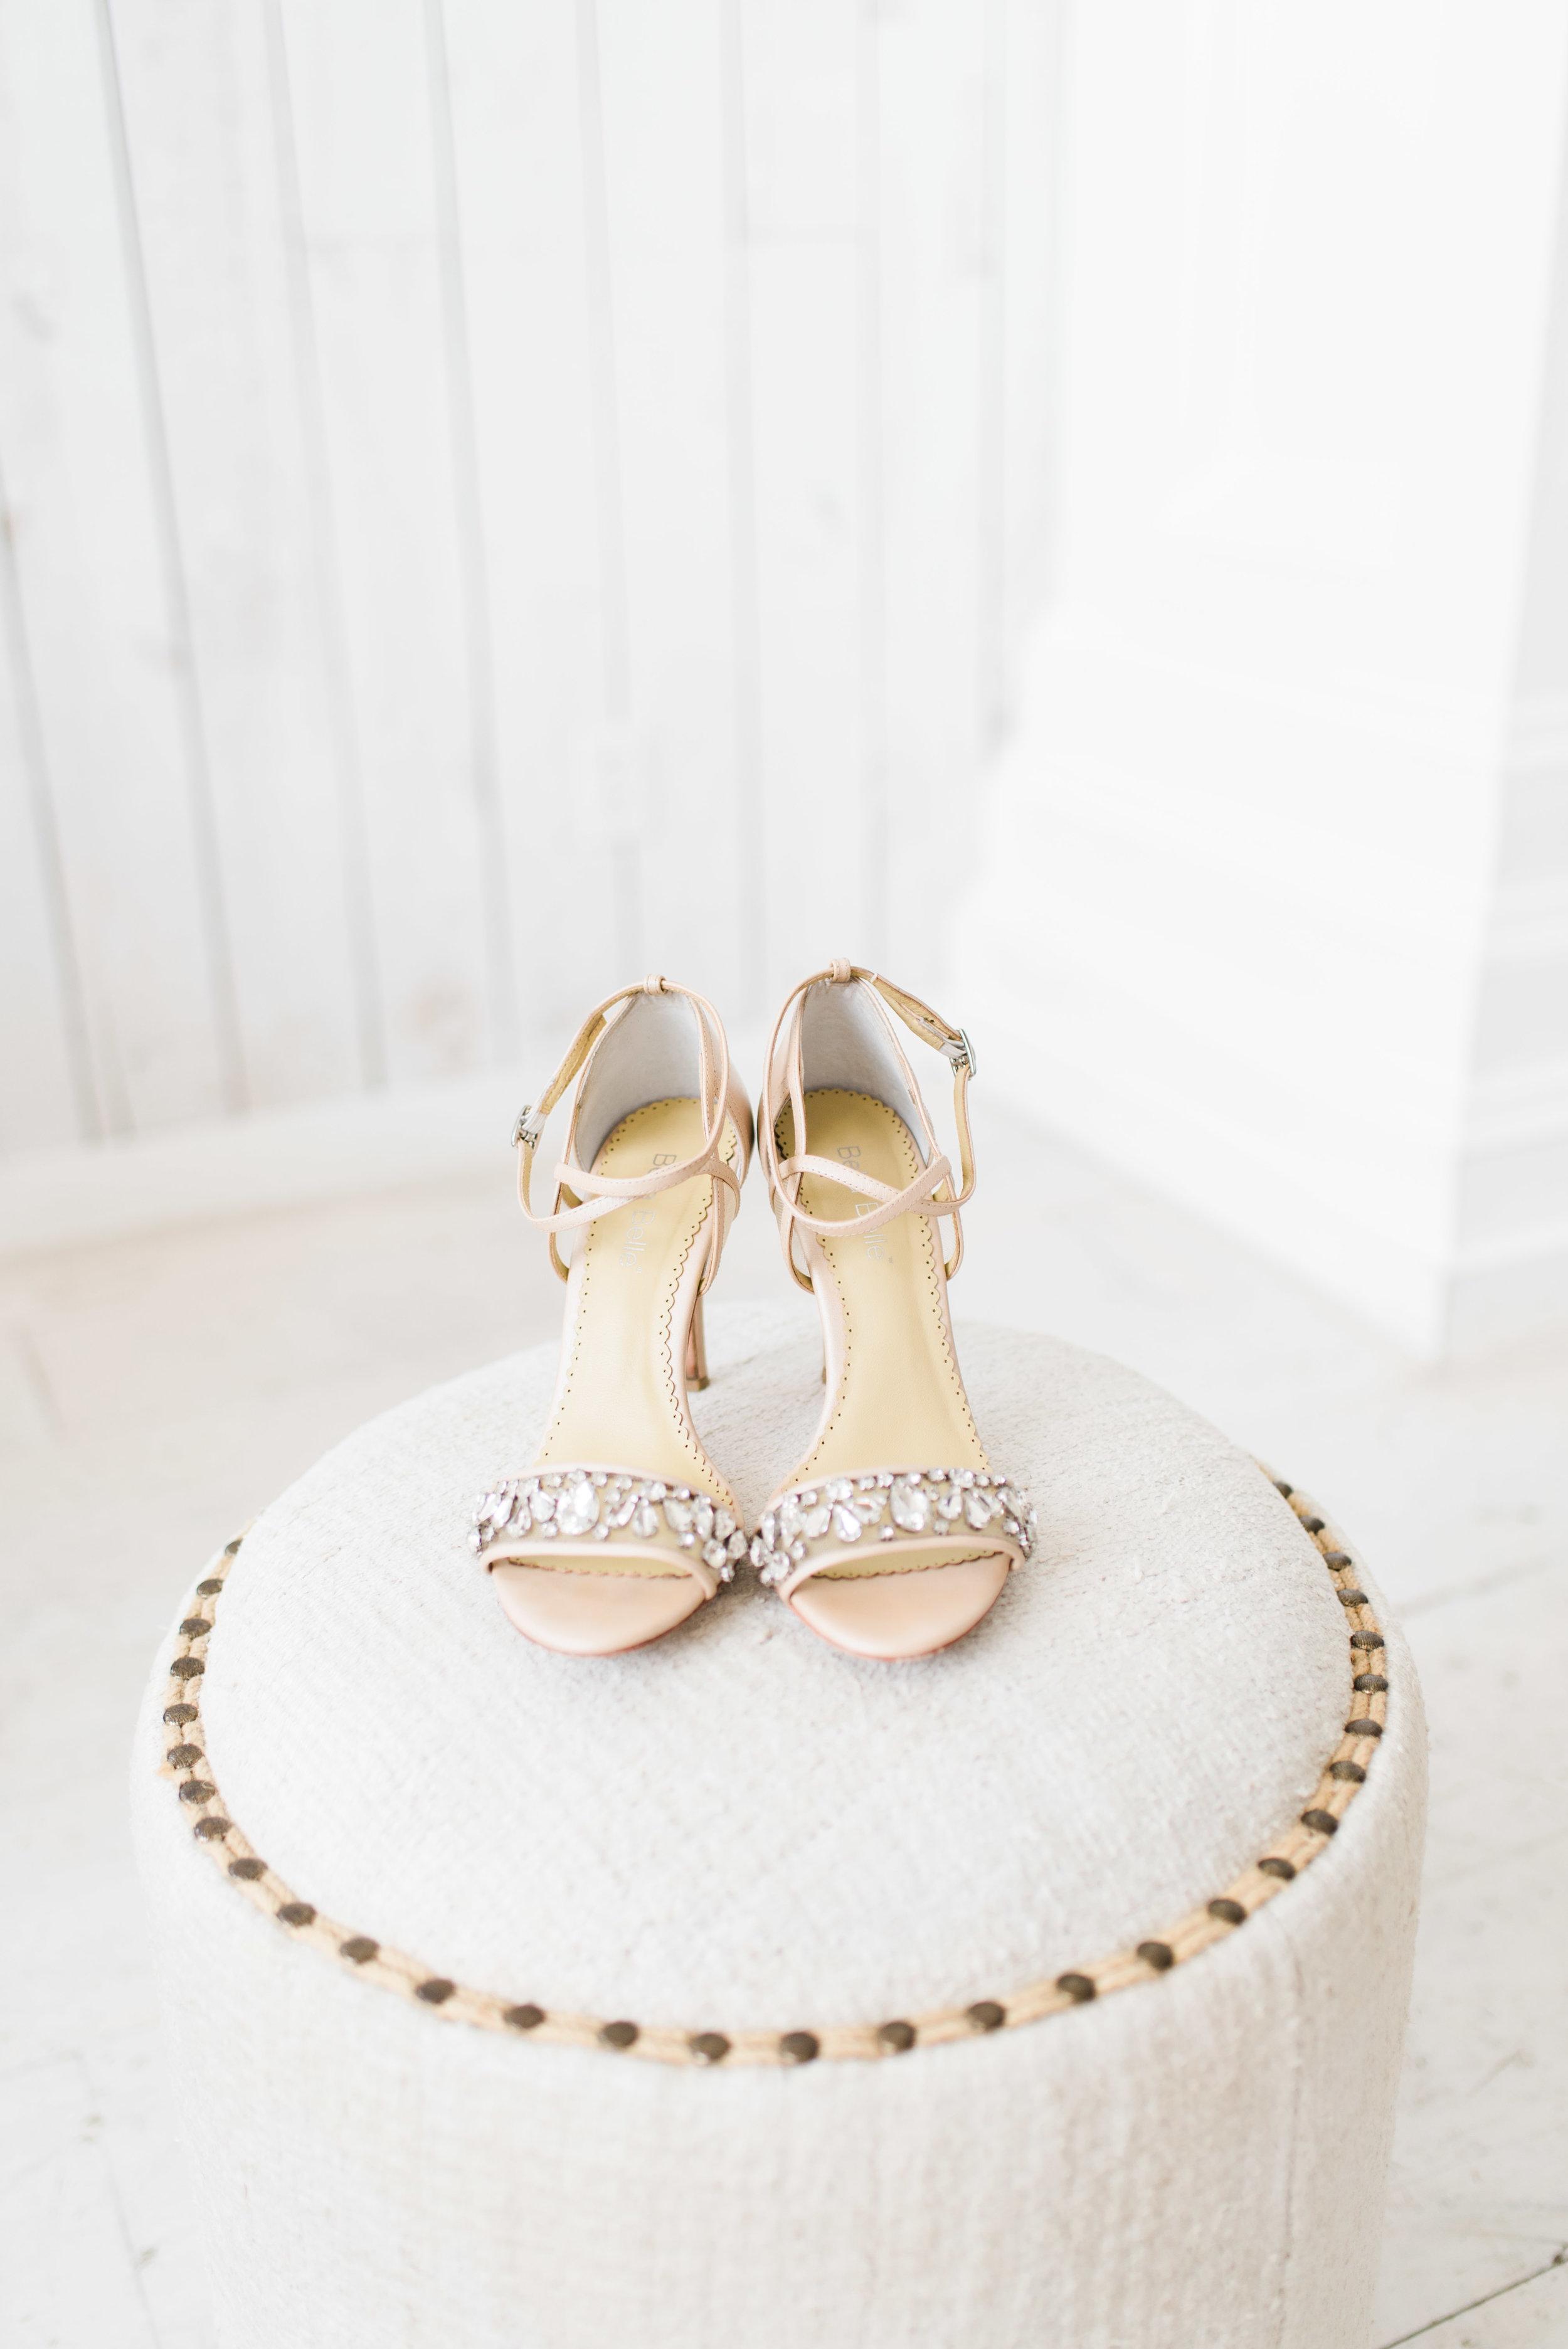 gray-door-photography-wedding-photographer-steph-erffmeyer-dallas-destination-bridal12.jpg